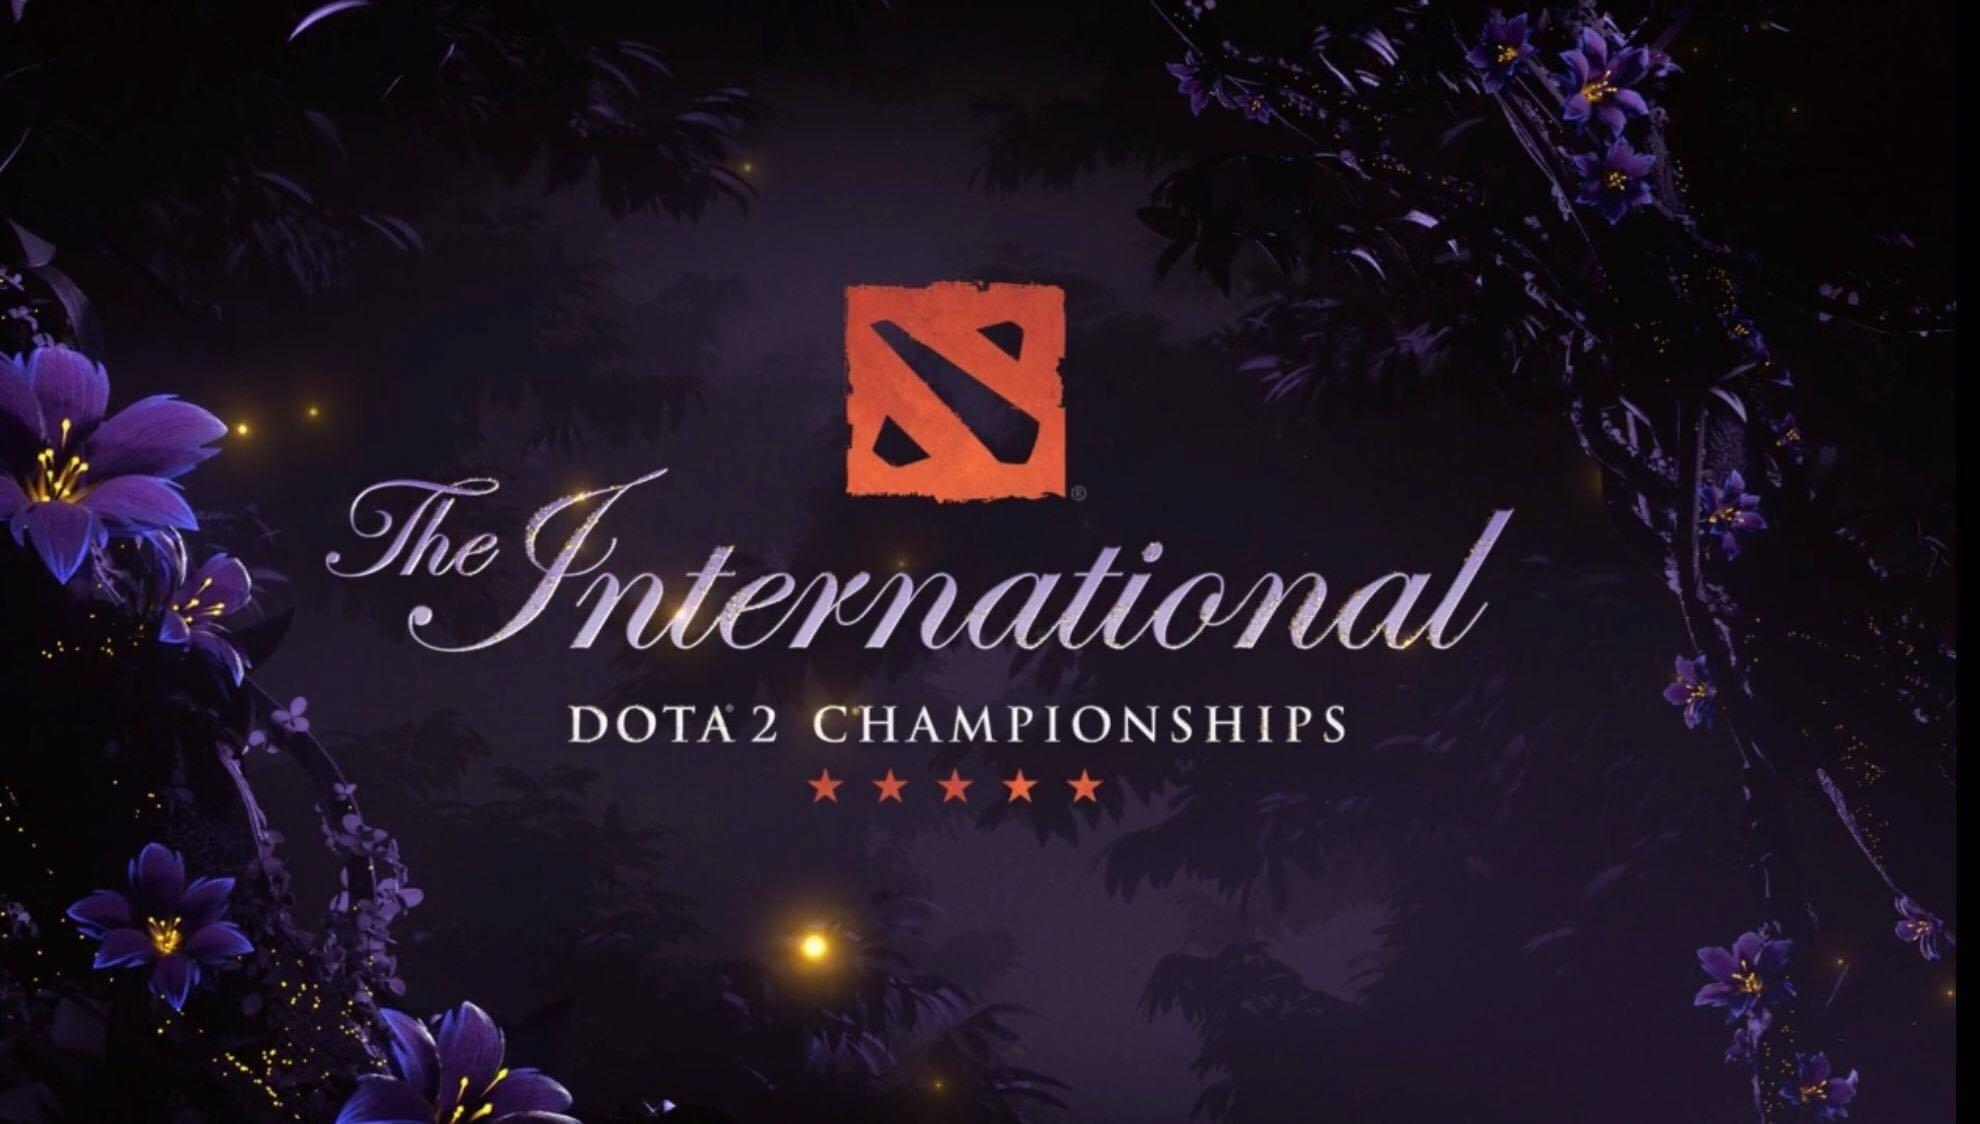 ti9-grand-finals-results-og-vs-liquid_feature-the-international9